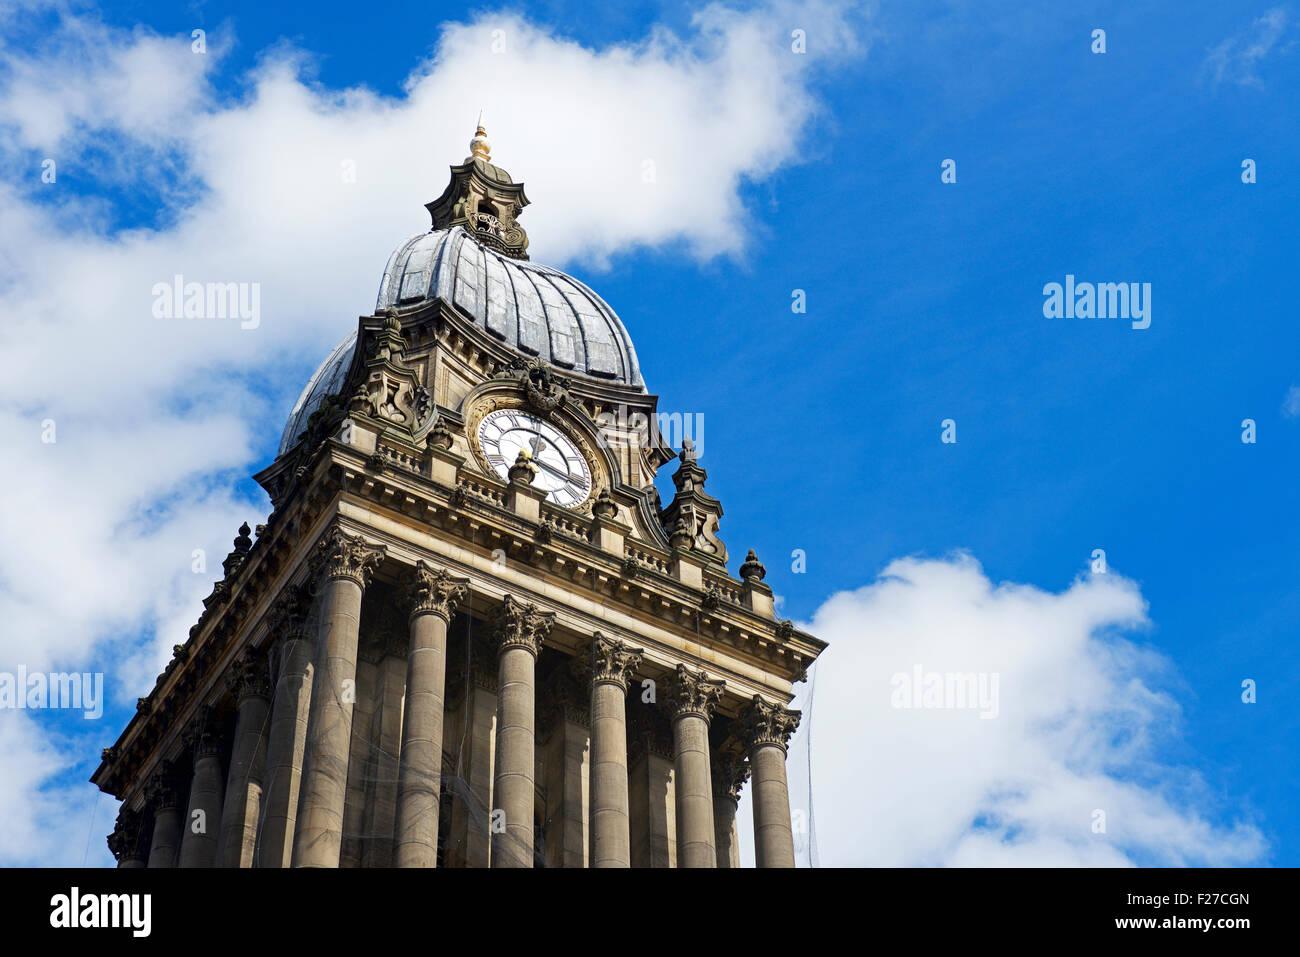 Leeds Town Hall, West Yorkshire, England UK - Stock Image